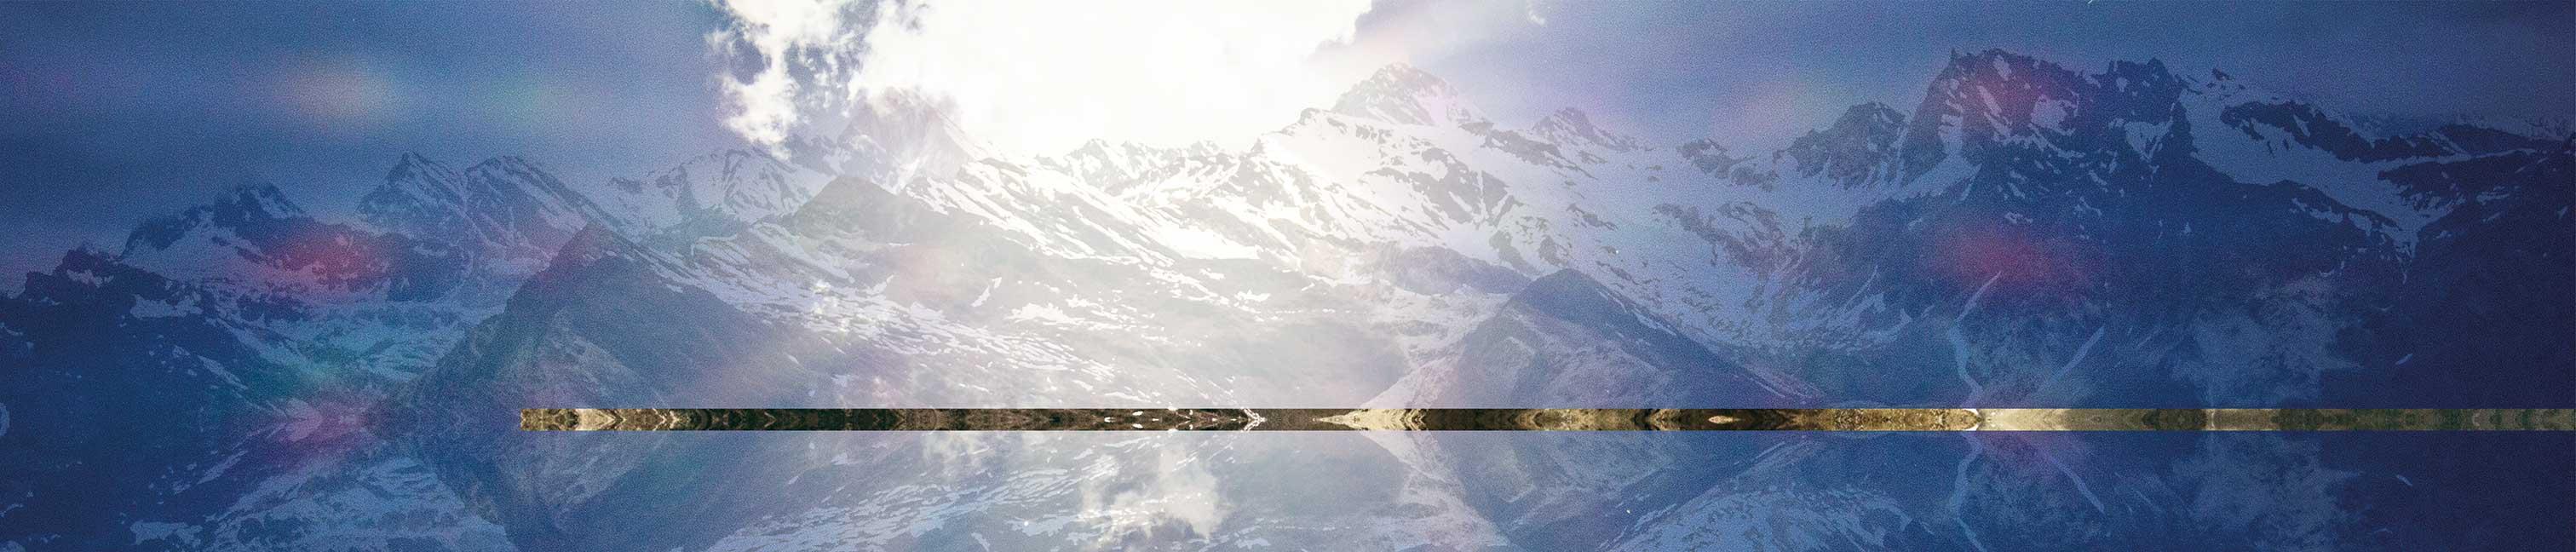 5-Bergpanorama-2--240x50cm-Fotoprint auf Leinwand